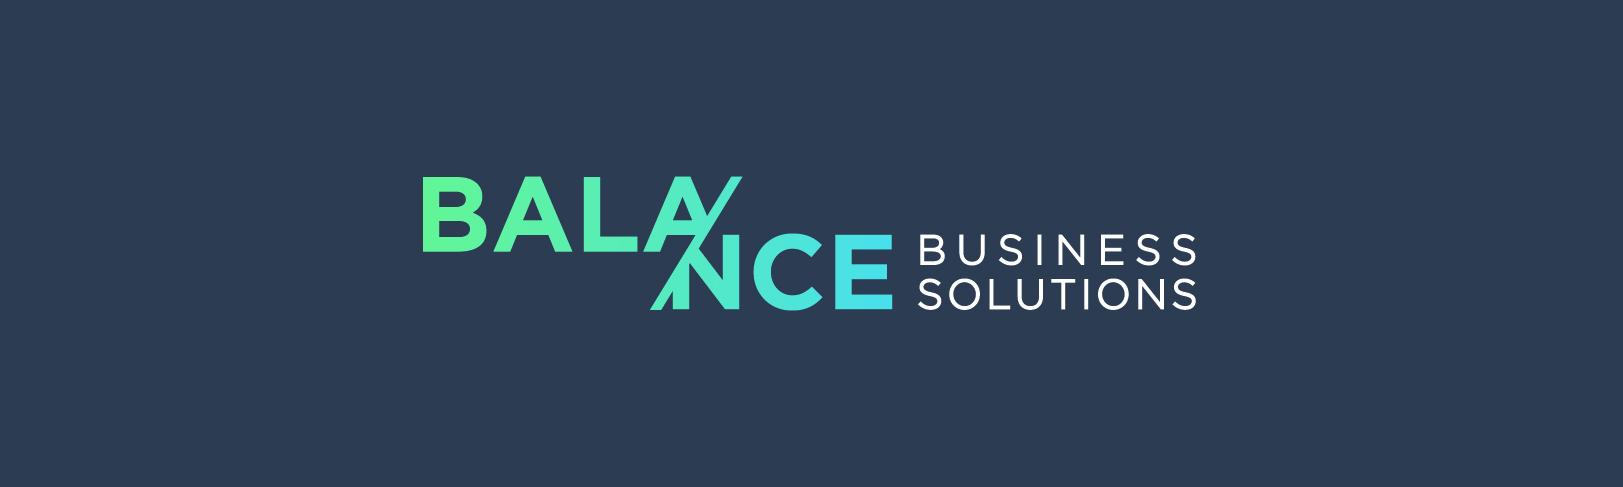 strategic marketing solutions